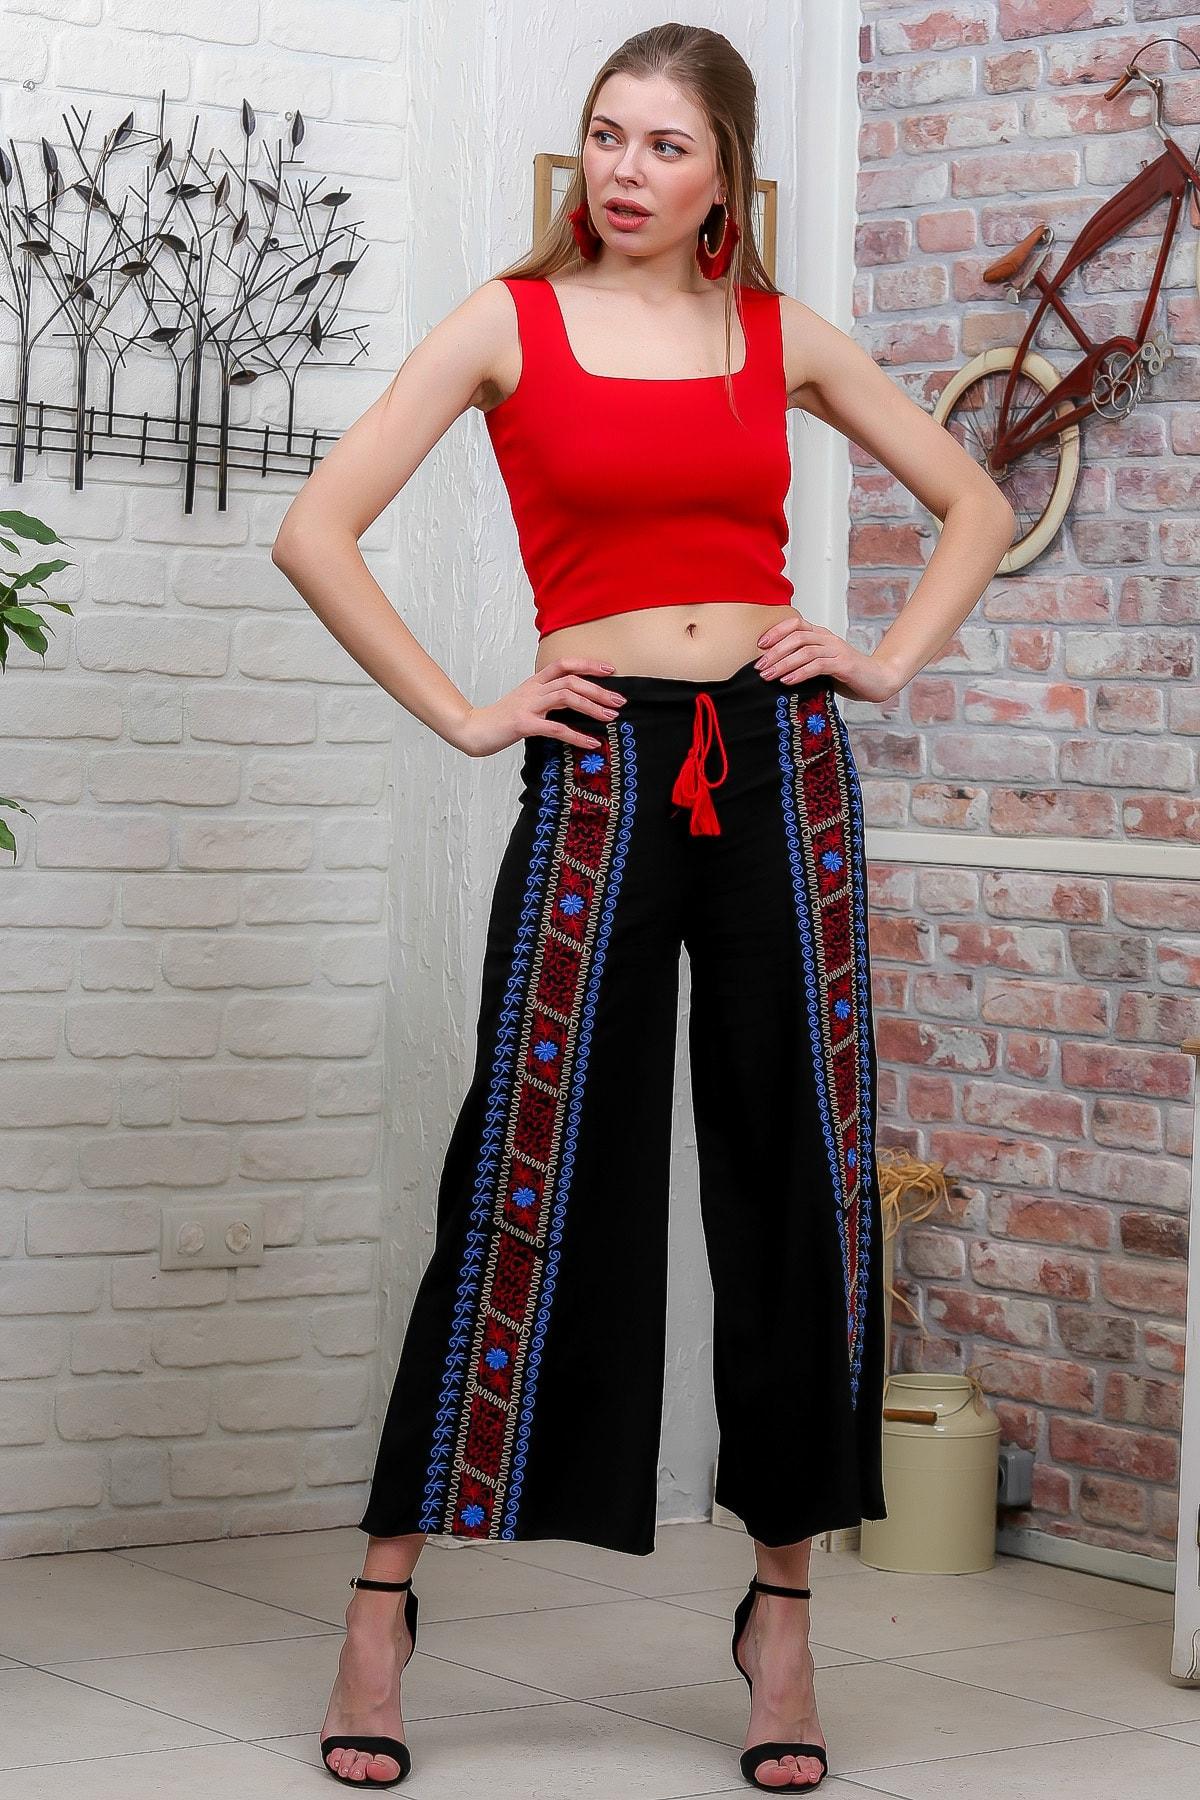 Chiccy Kadın Siyah Nakış Detaylı Bağcıklı Bol Paça Dokuma Pantolon M10060000PN98929